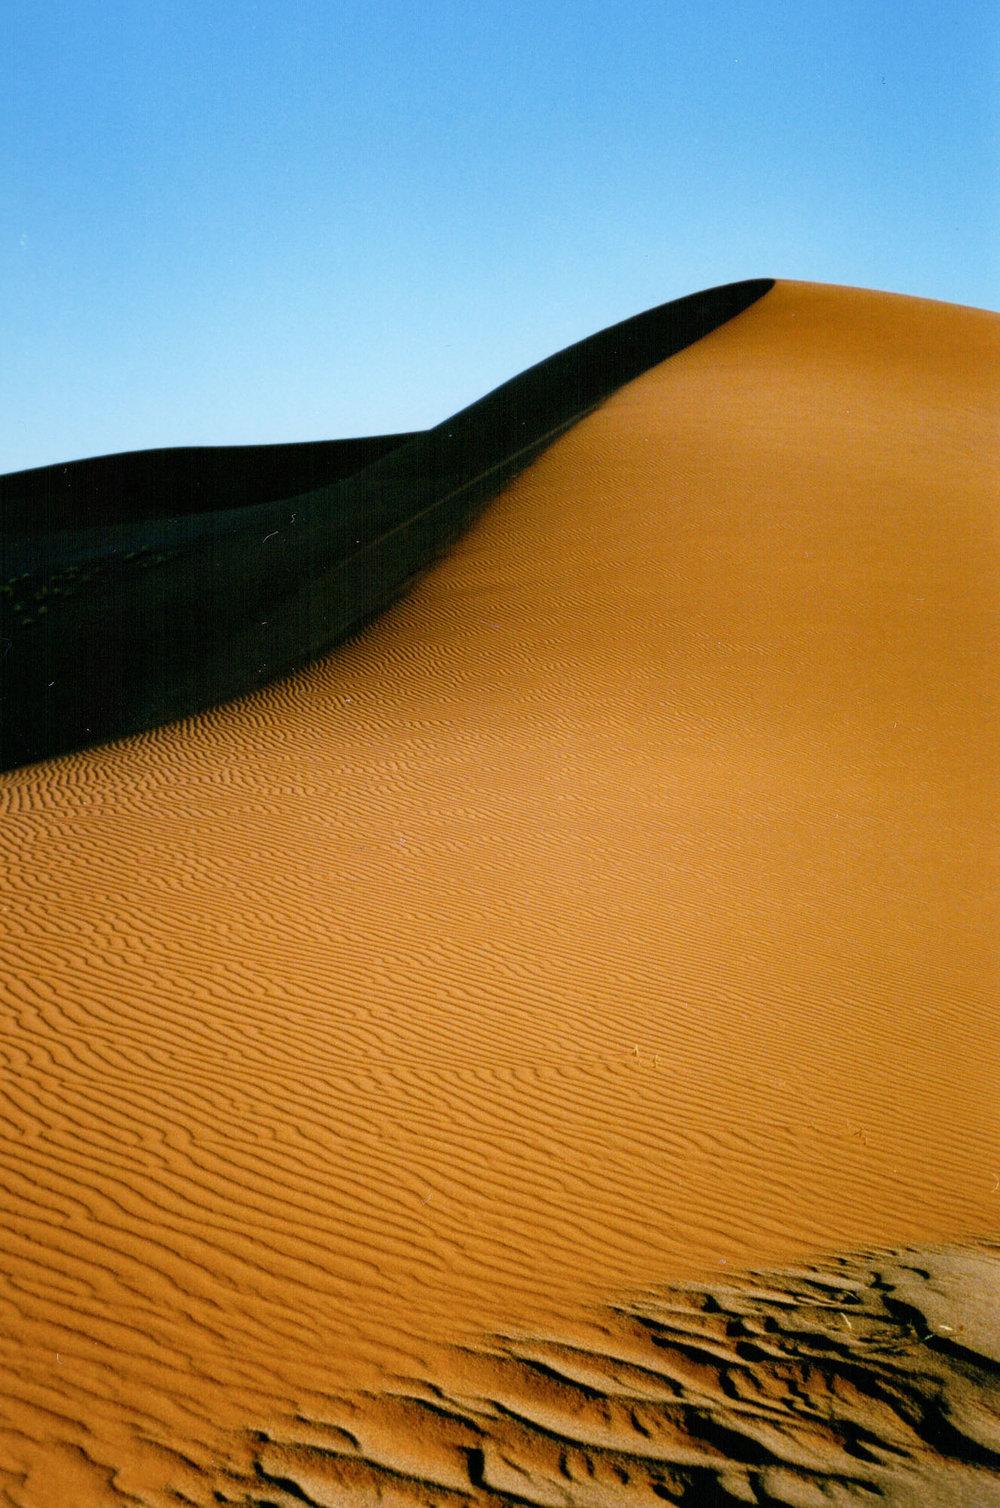 """Sossusvlei Dunes"" Namibia"